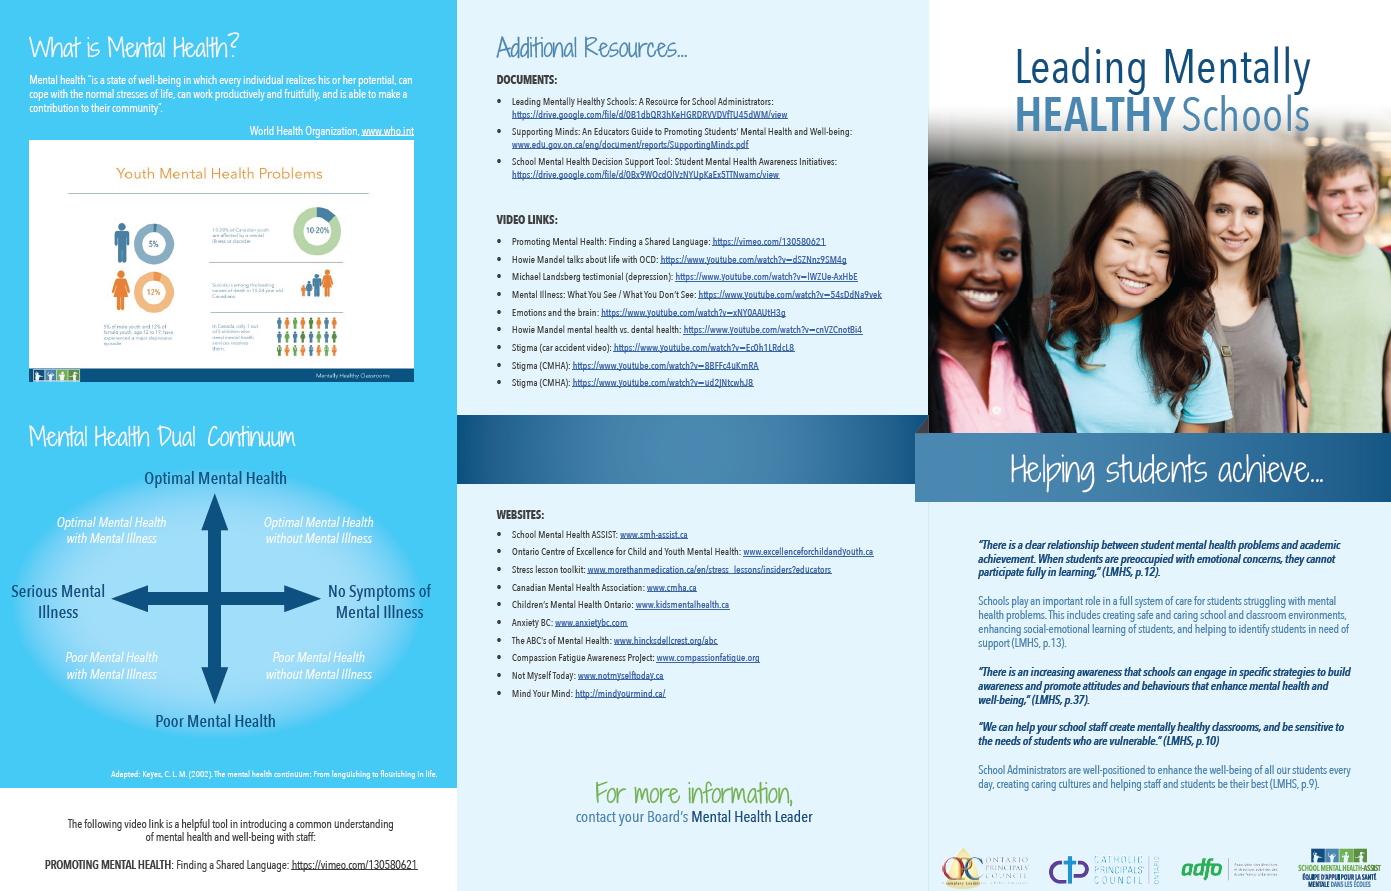 SMH-ASSIST » Leading Mentally Healthy Schools Brochure: a